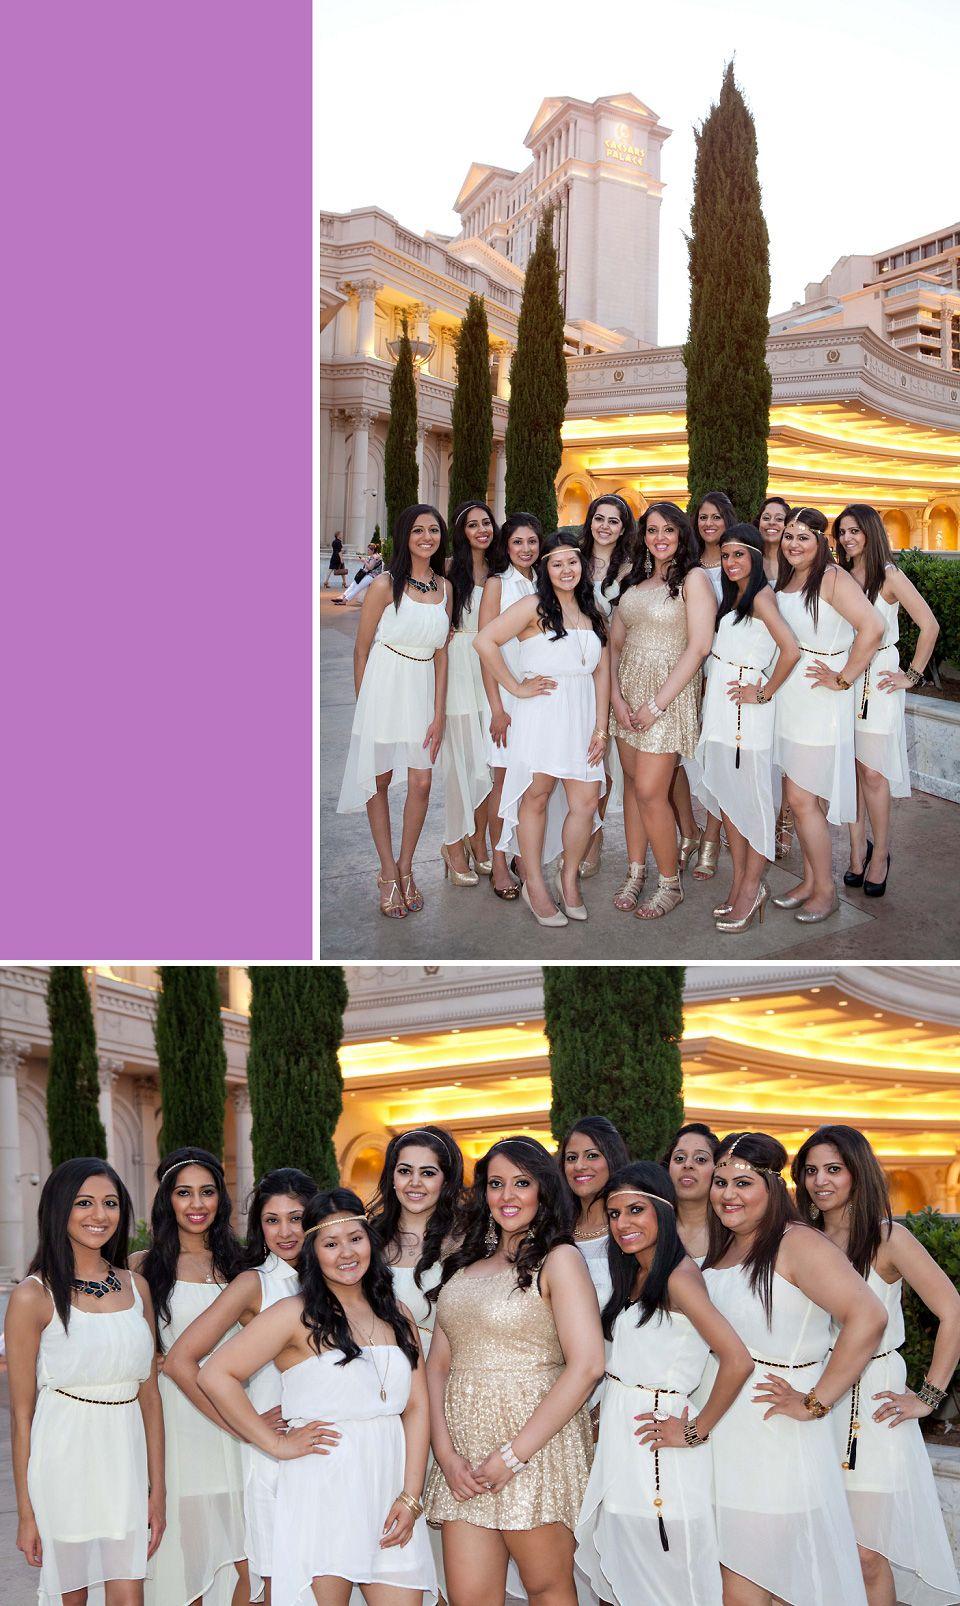 bachelorette party ideas | greek goddess themed bachelorette party